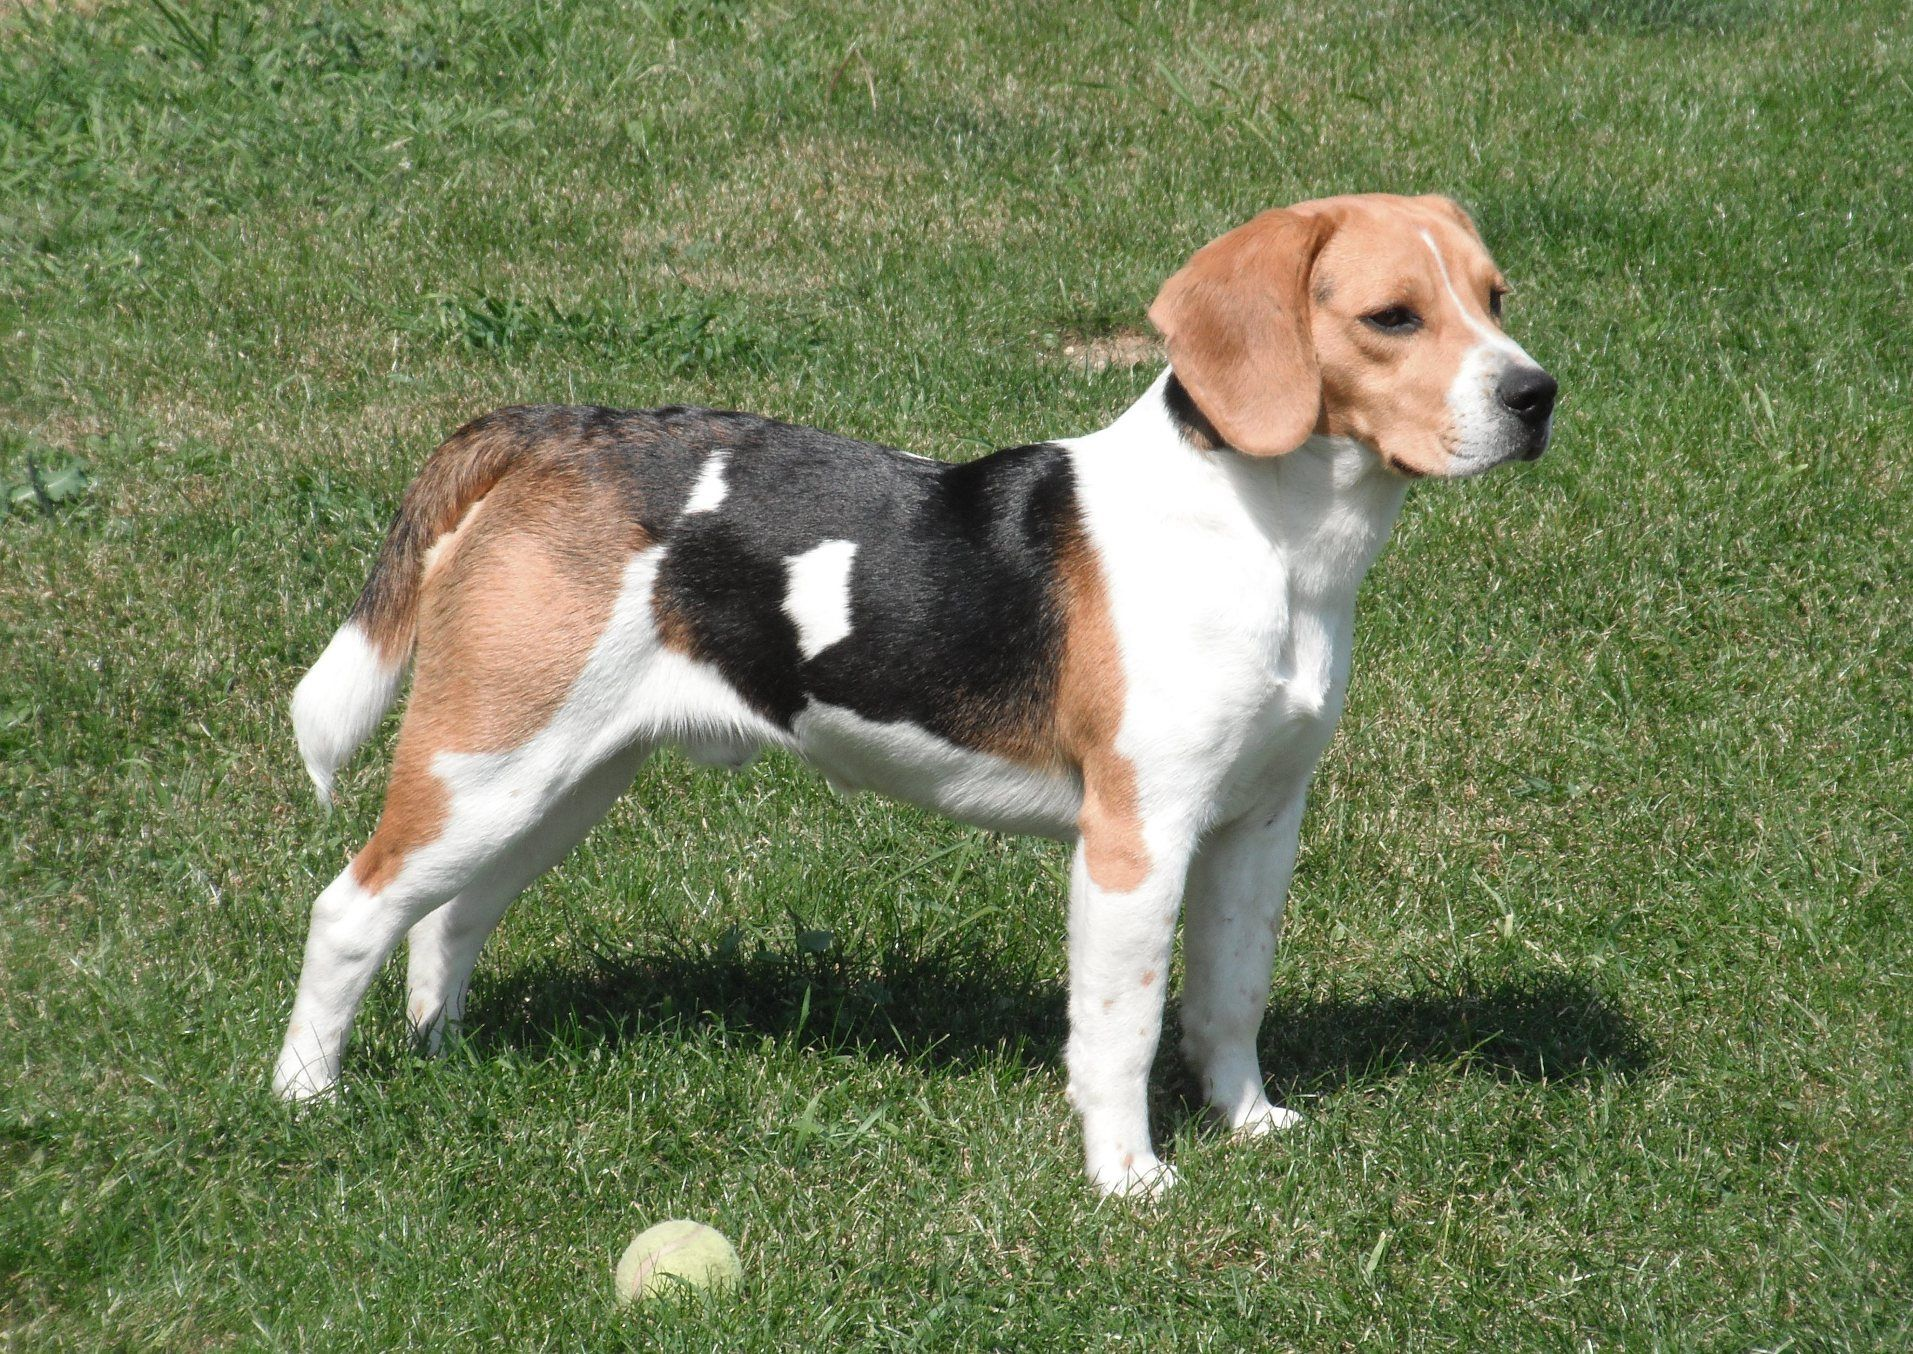 Beagle Dog 2 Beagle Dog Popular Dog Breeds Dog Breeds